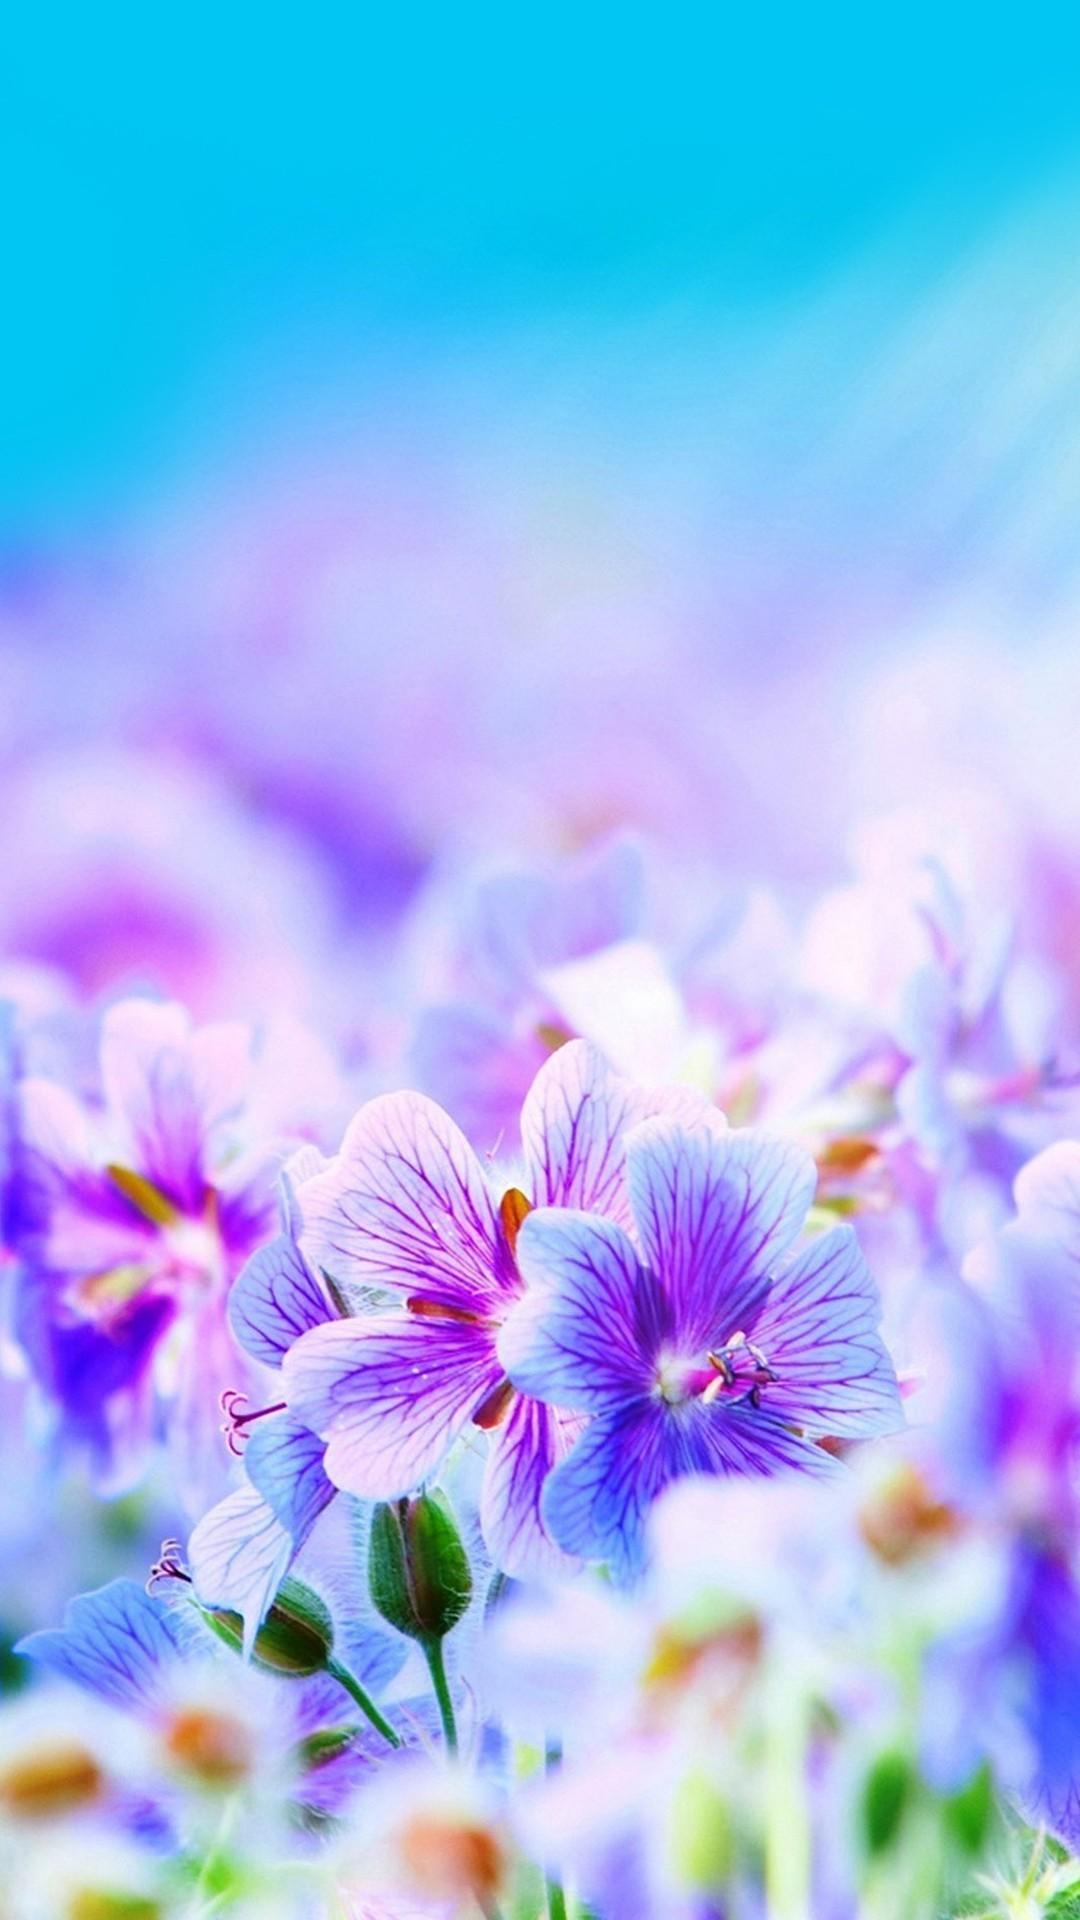 mobile screensaver wallpaper flowers - photo #16